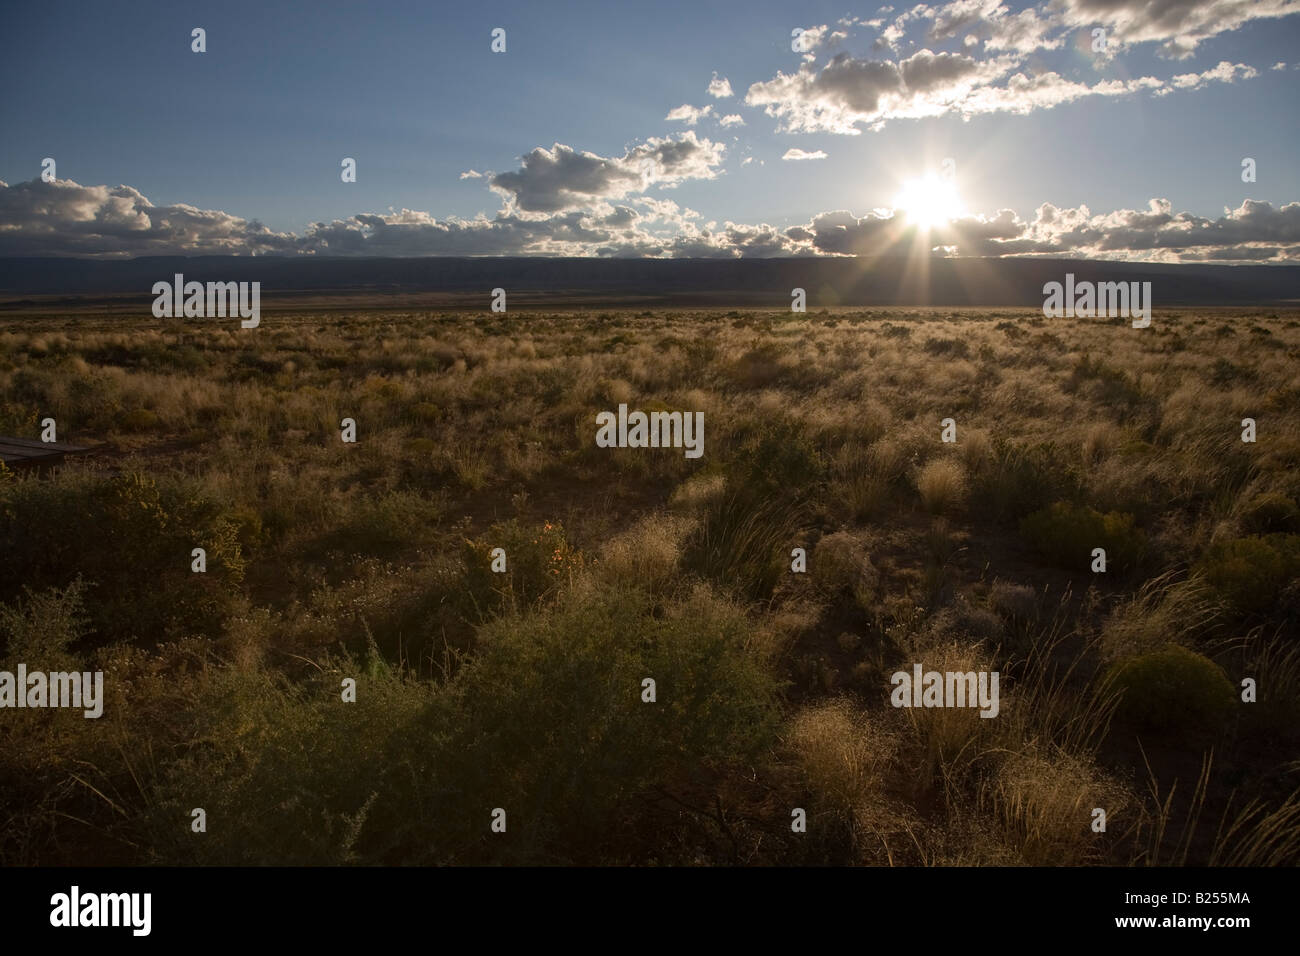 American prairie at sunset in Arizona, USA - Stock Image